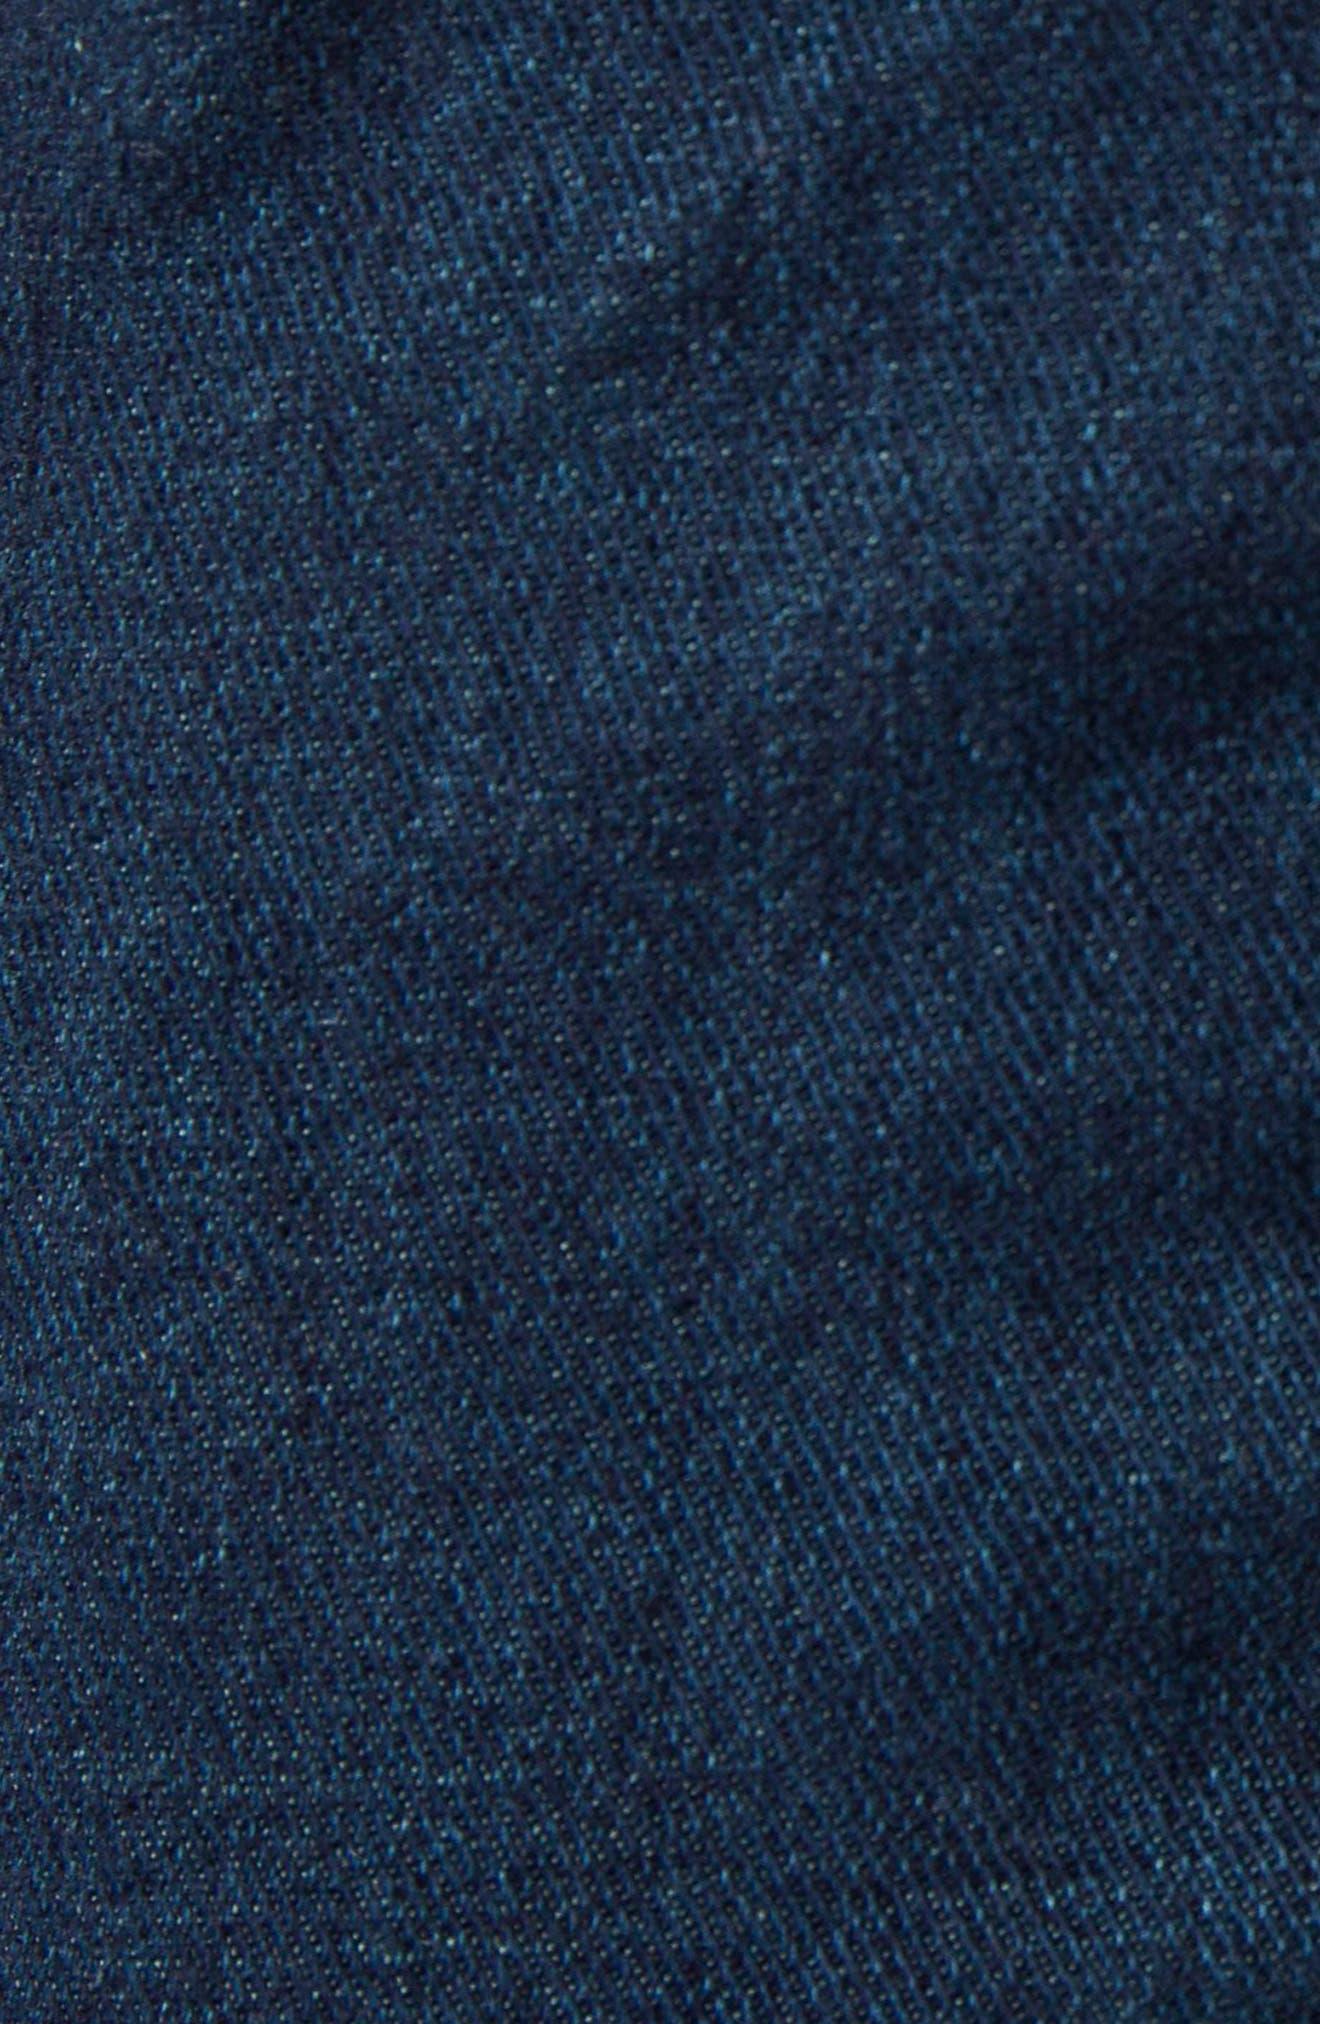 Moto Skinny Fit Jeans,                             Alternate thumbnail 5, color,                             403